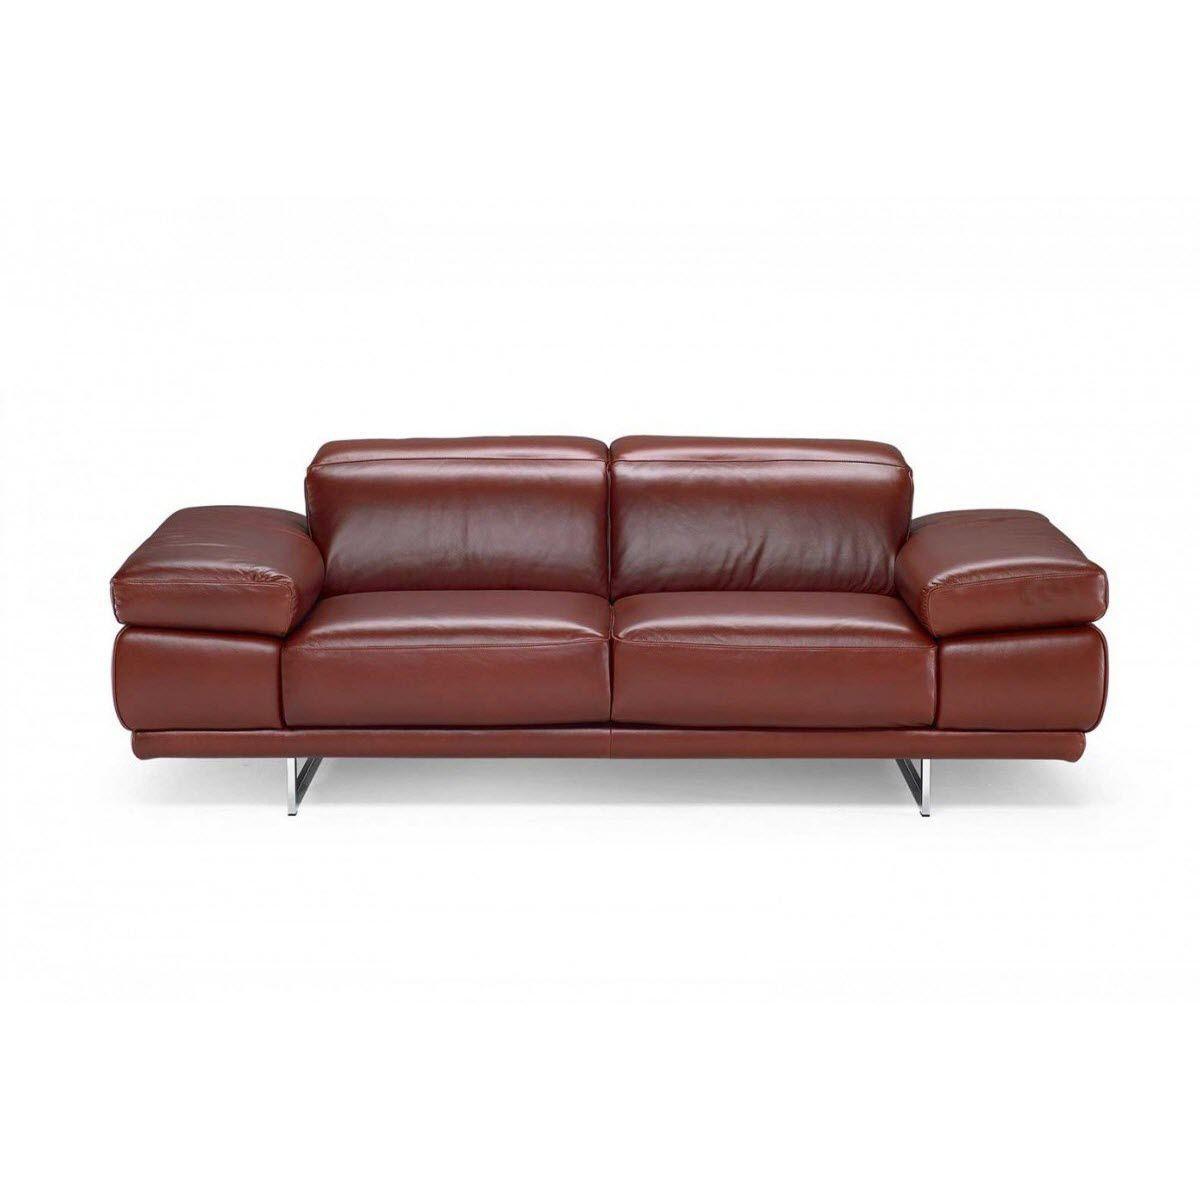 Modulierbares Sofa / modern / Leder / Stoff - PRELUDIO - NATUZZI